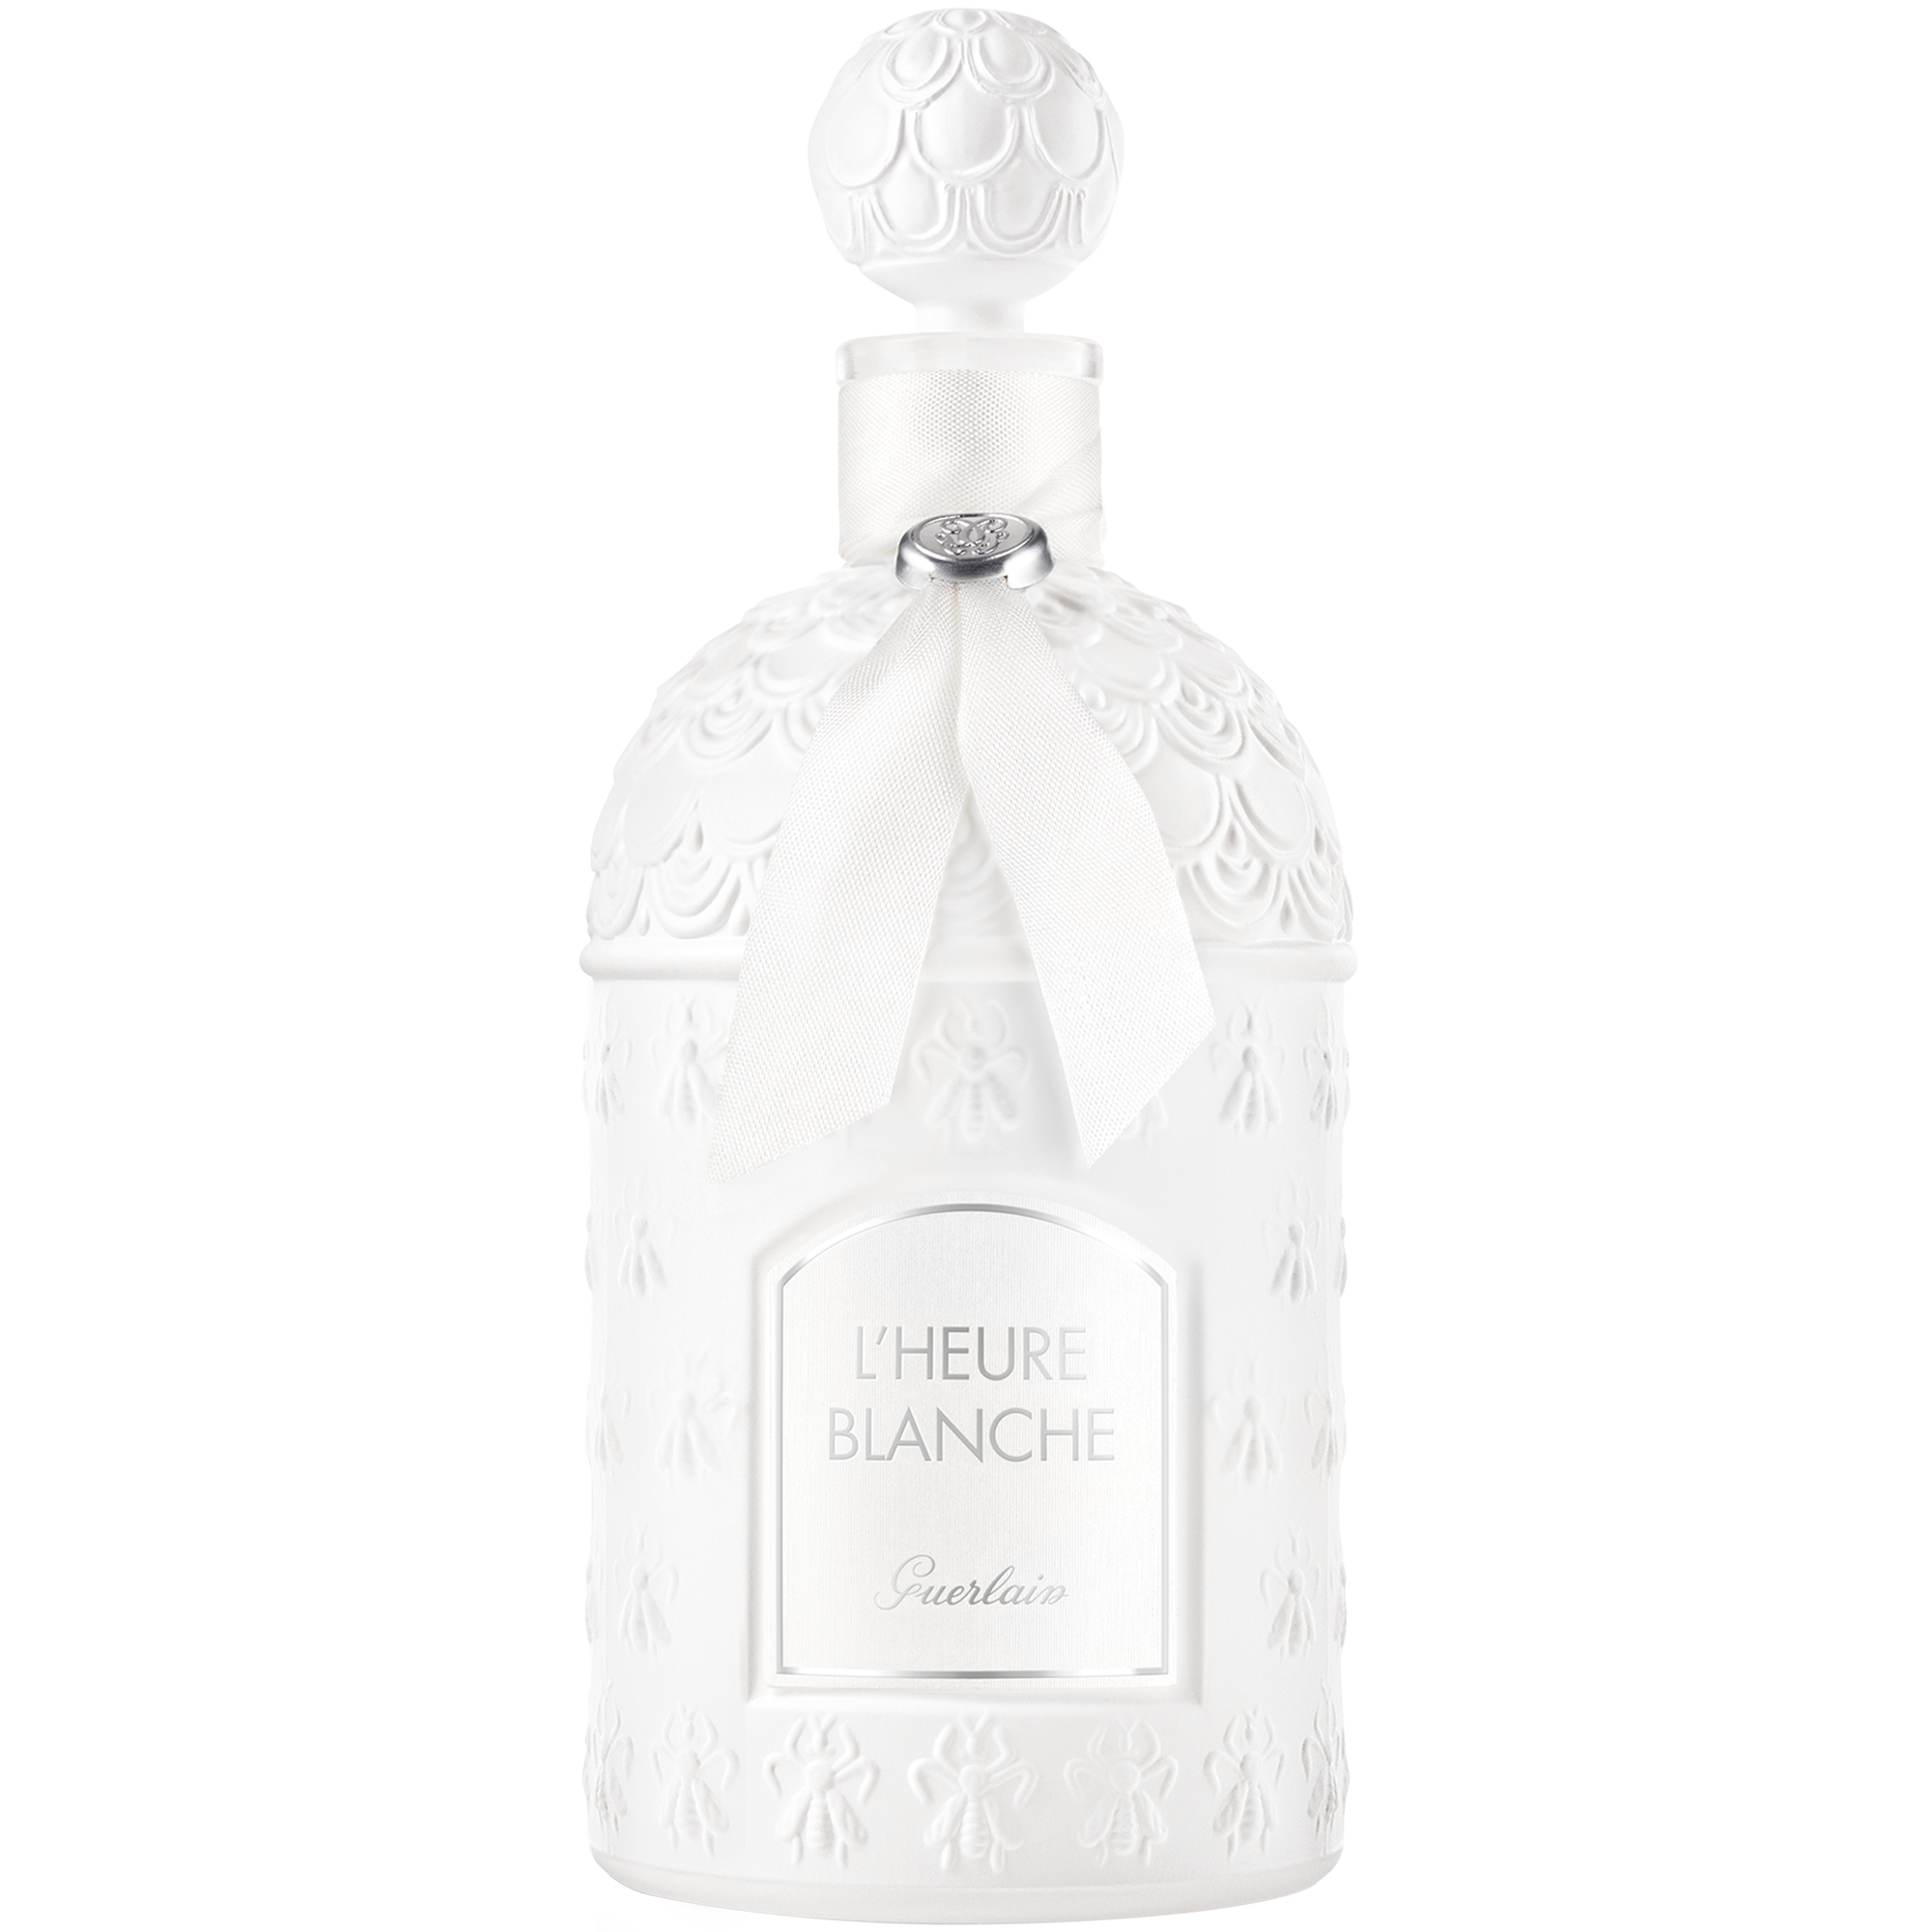 Guerlain-L'Heure-Blanche-Flacon